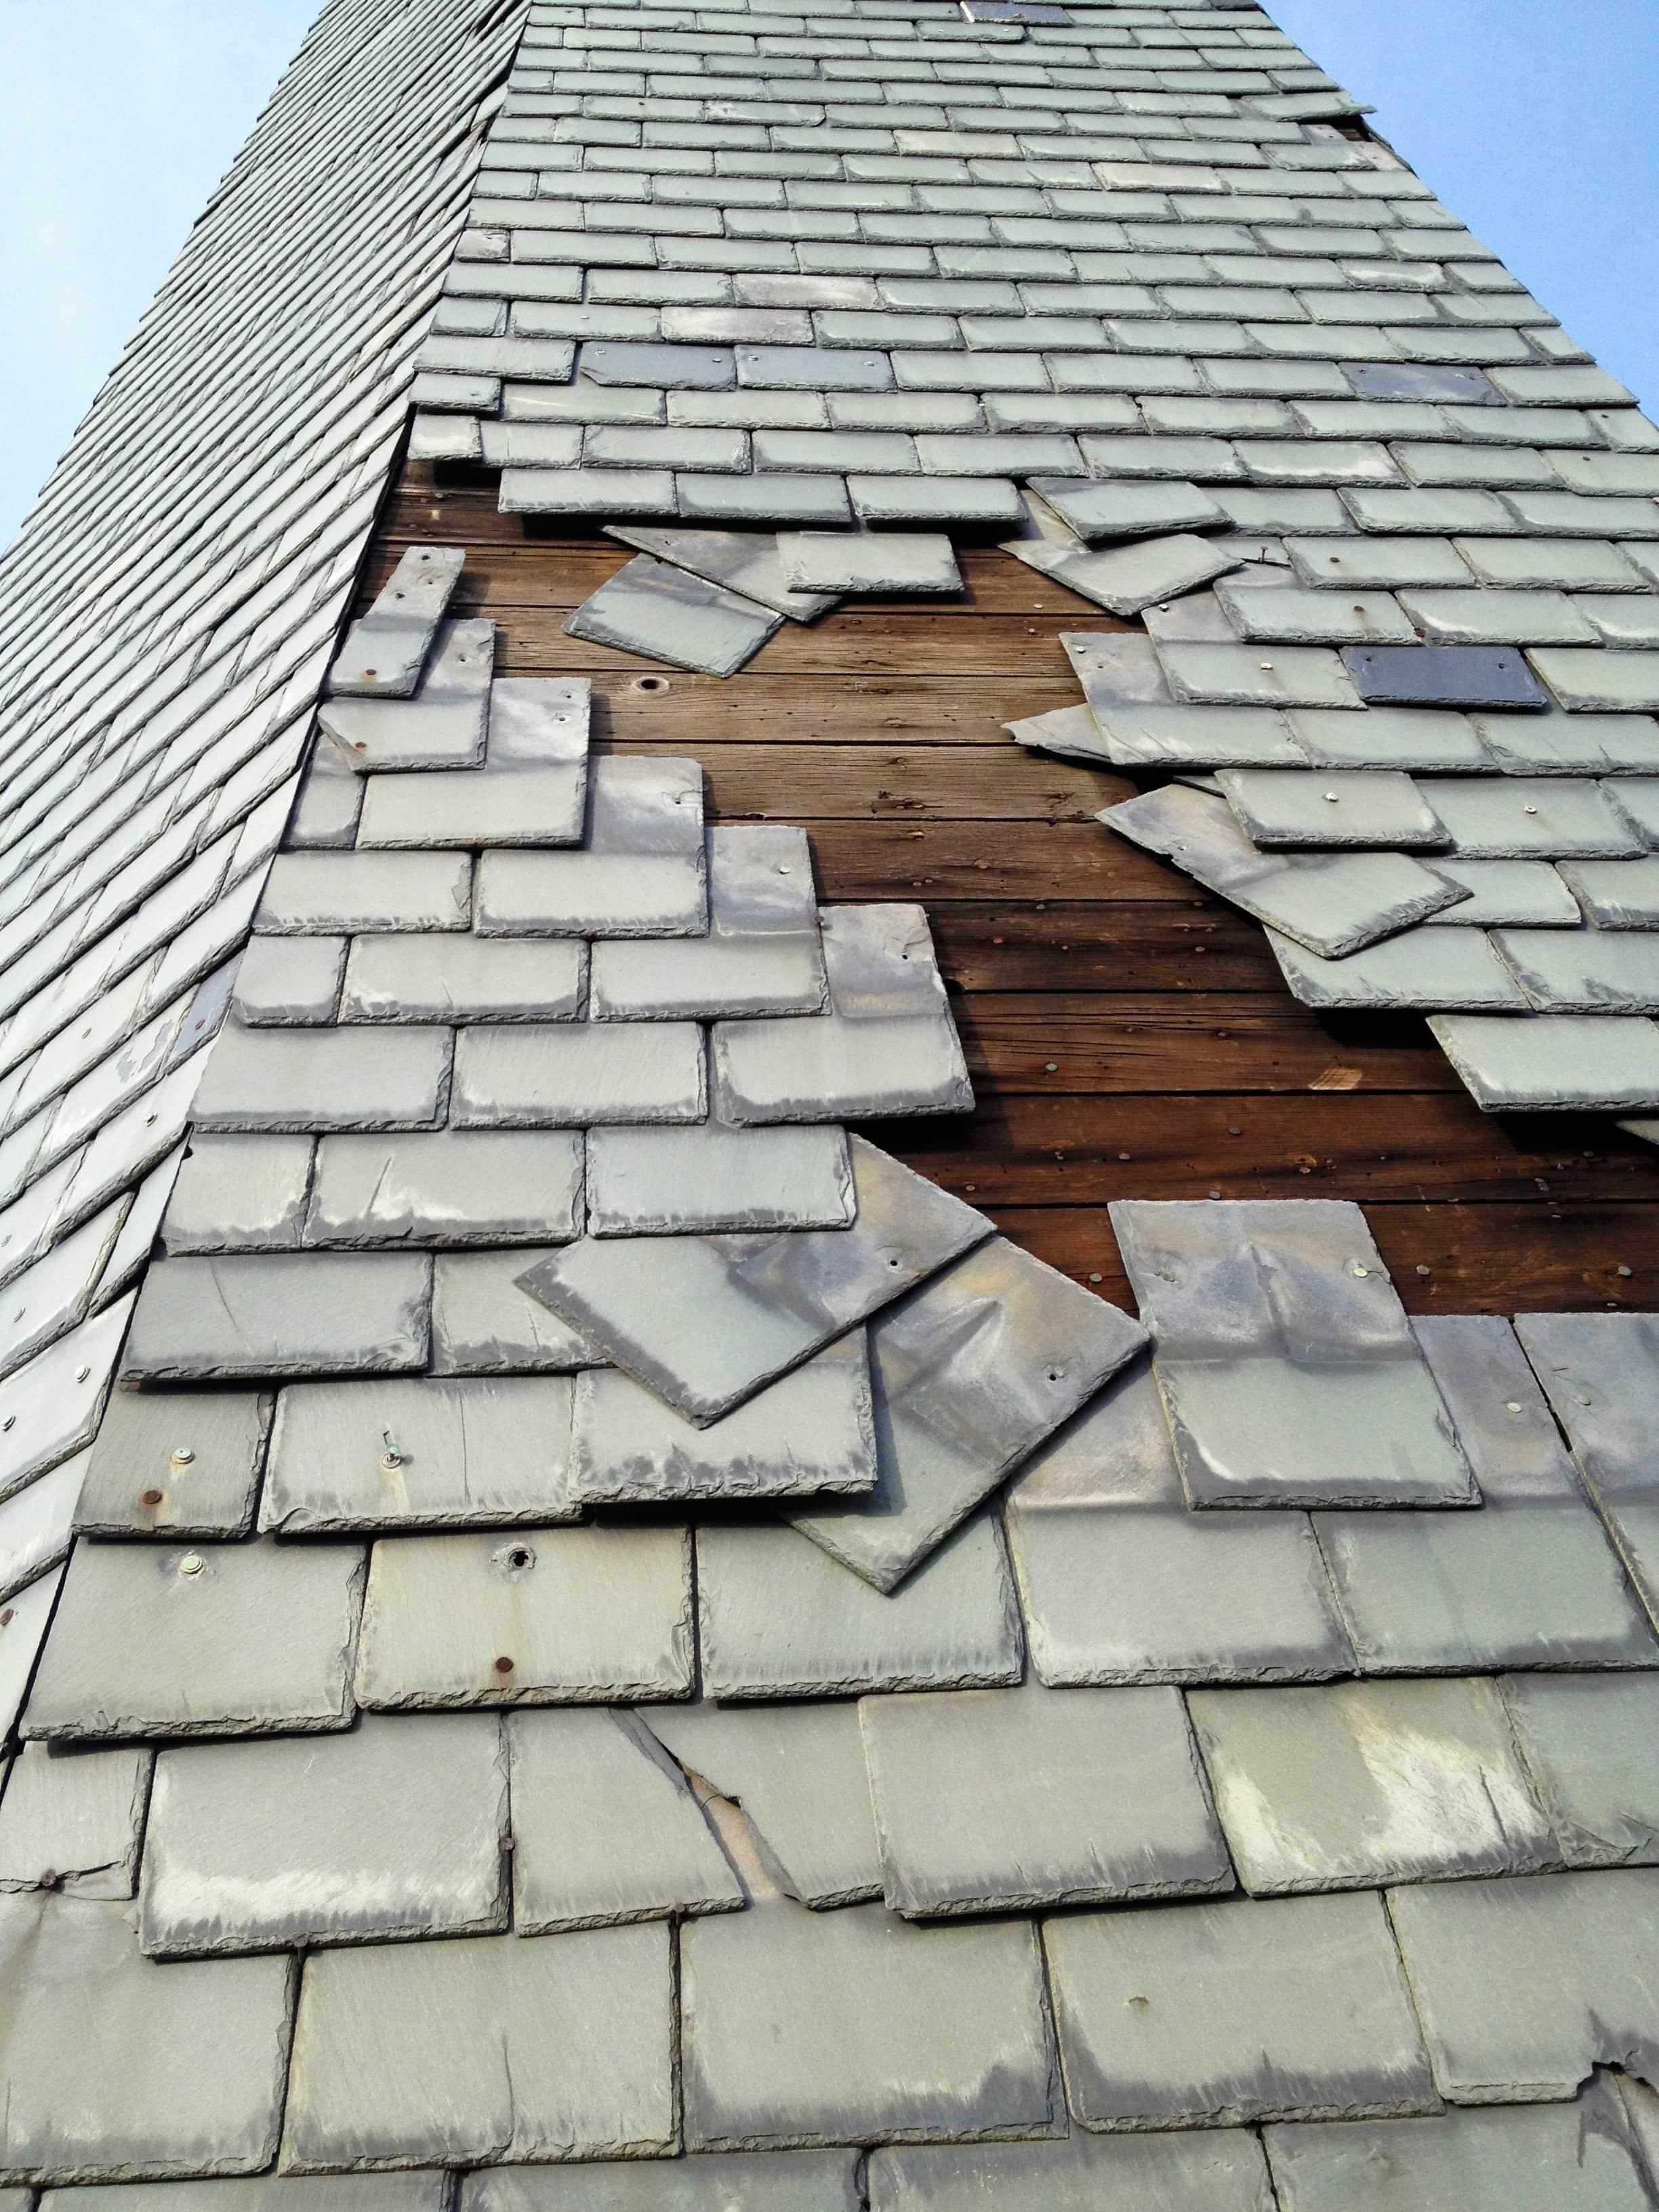 Slate roof damage on a church steeple due to high winds for Davinci slate roof reviews